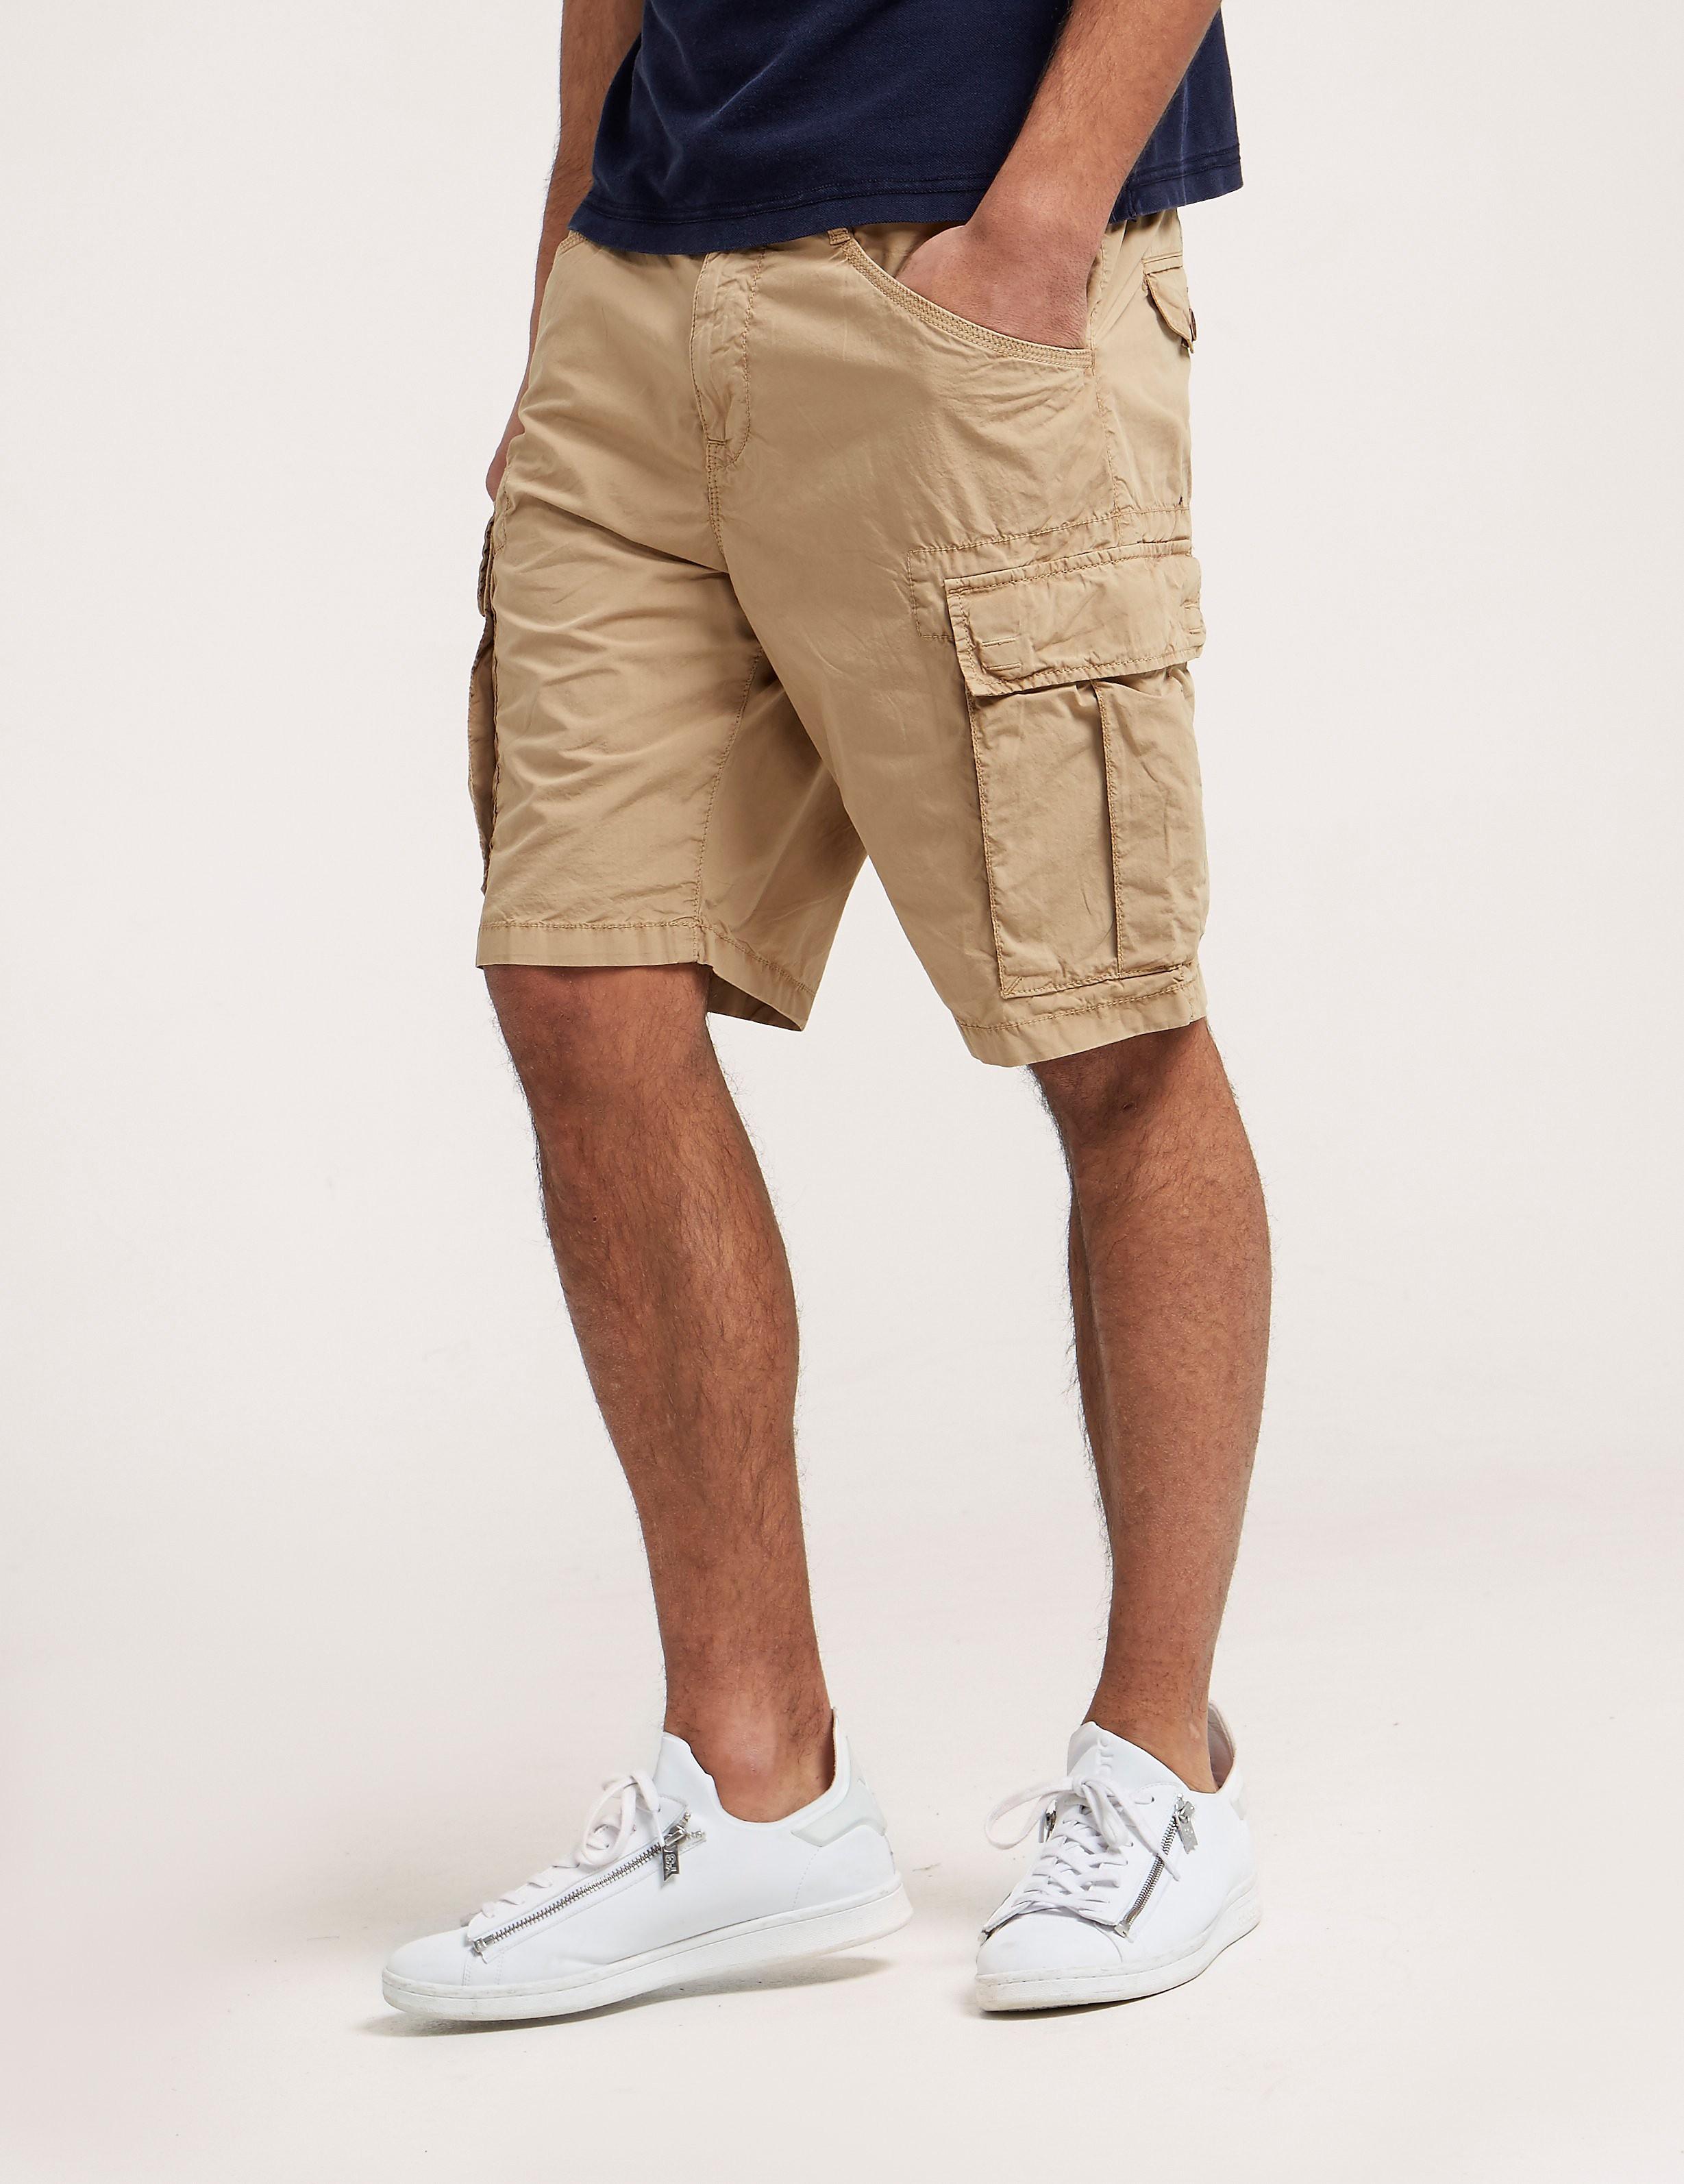 Napapijri Noto Cargo Shorts